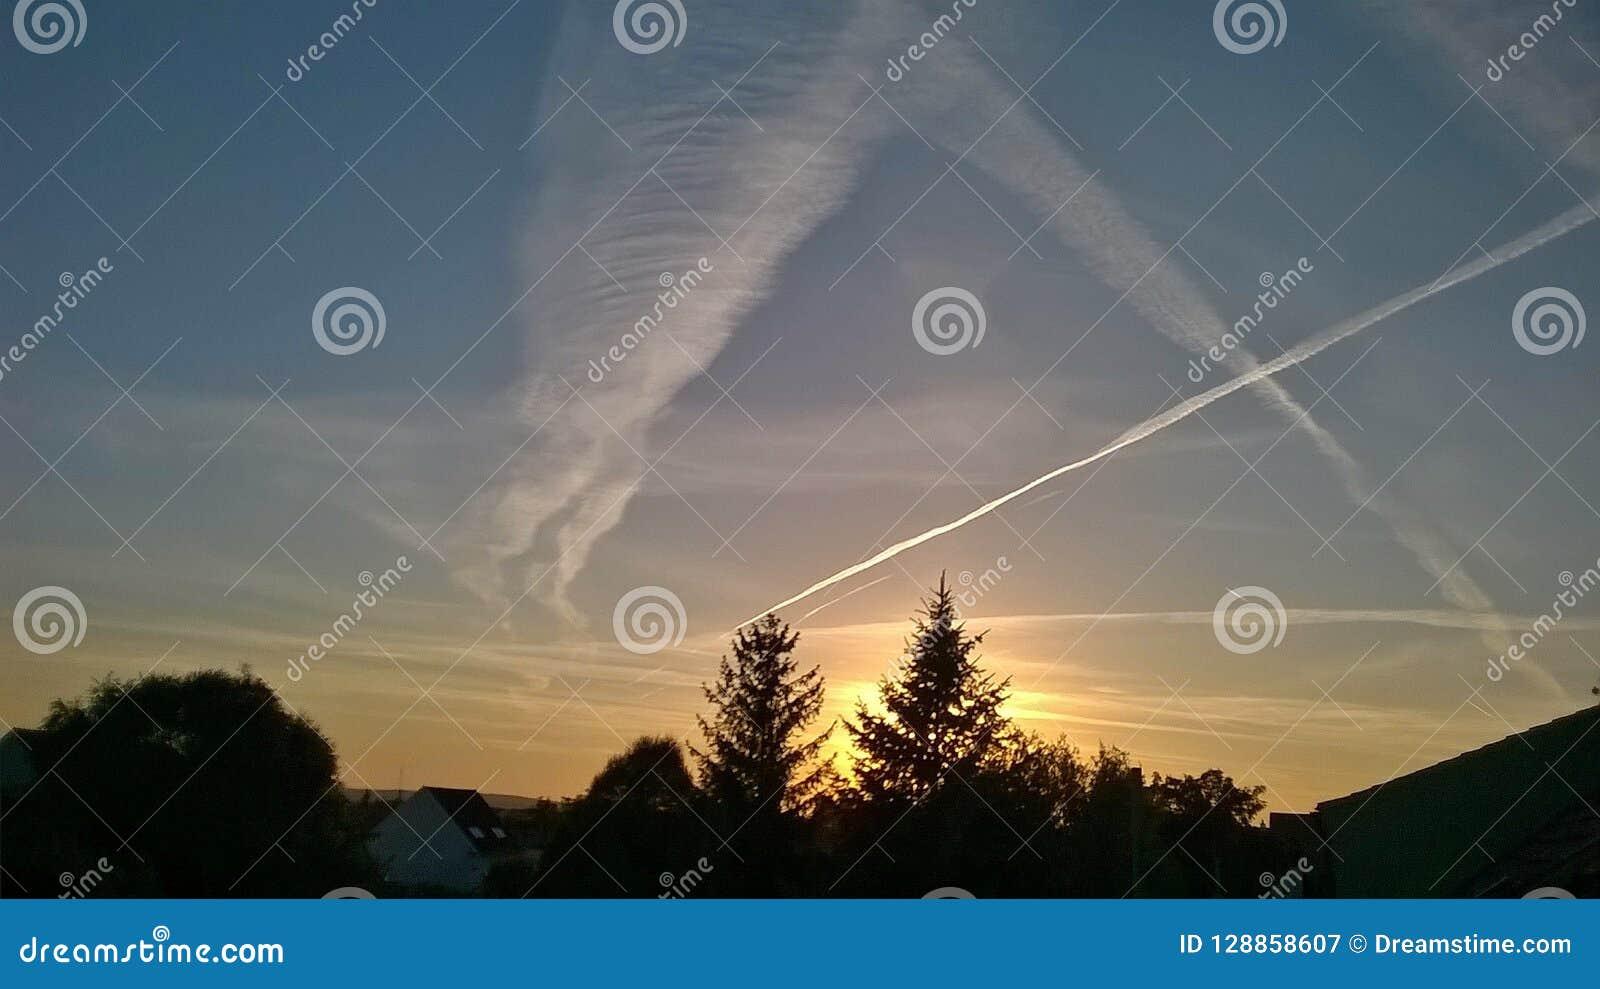 Sky, trees a twilight with amazing plane scenery